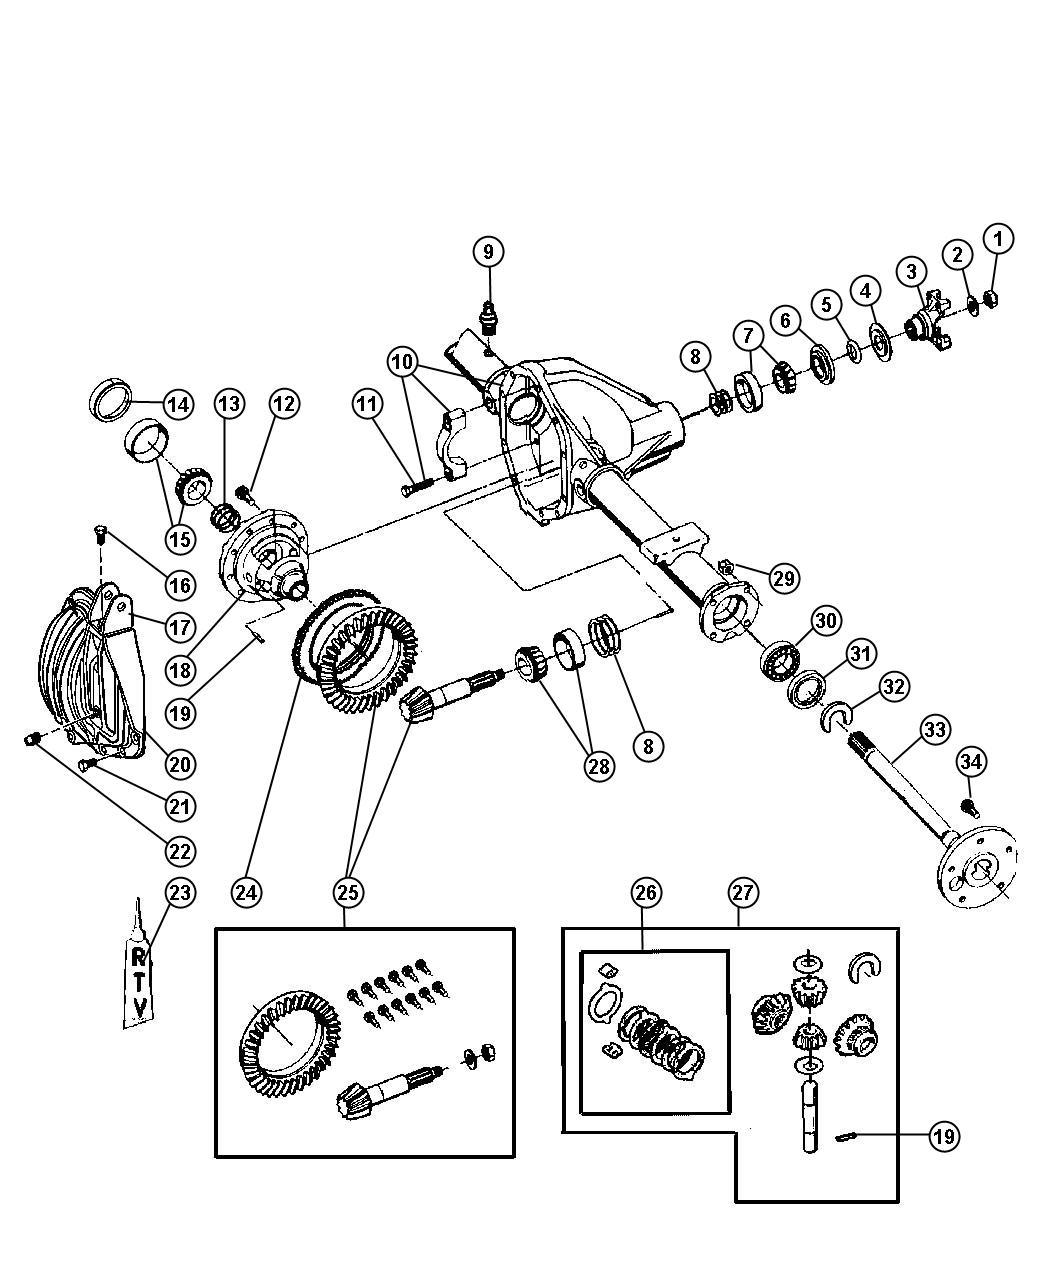 Dodge Ram Seal Axle Drive Shaft Partsdana